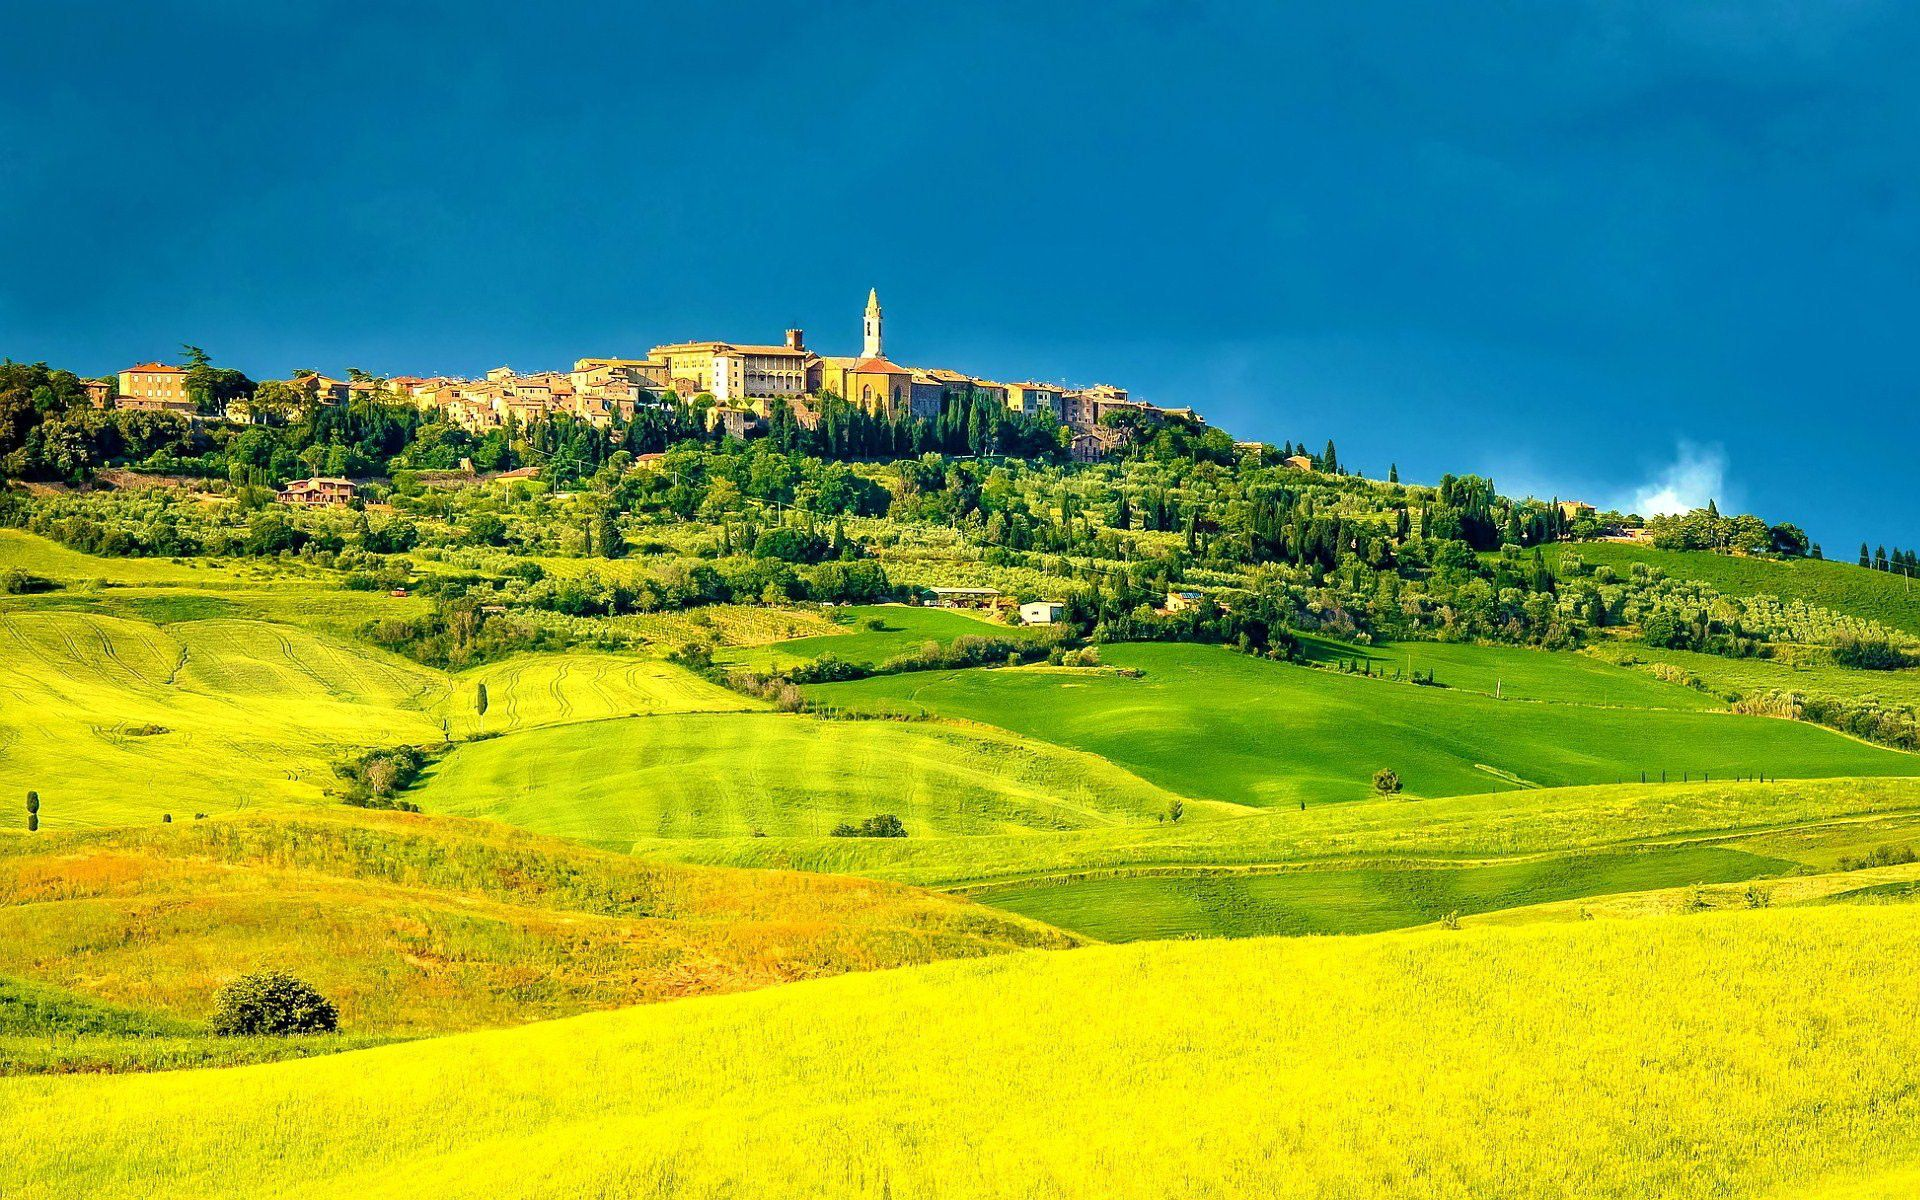 Campos De Toscana Na Itália , HD Wallpaper & Backgrounds